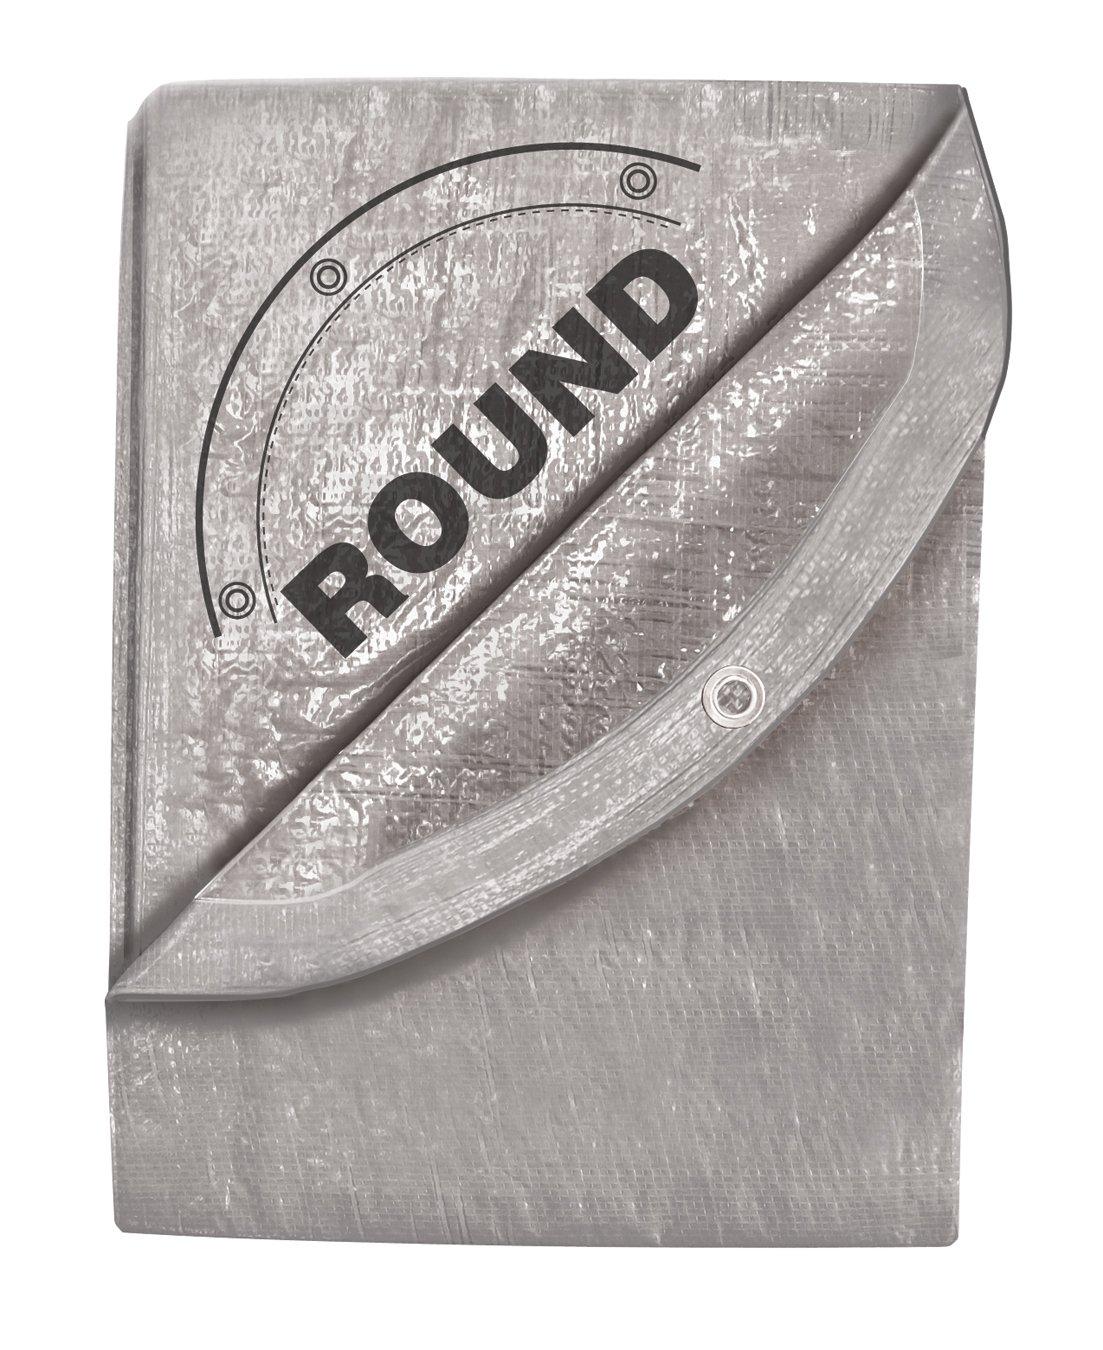 Round TEKTON 6405 29-Foot by 29-Foot Silver Tarp